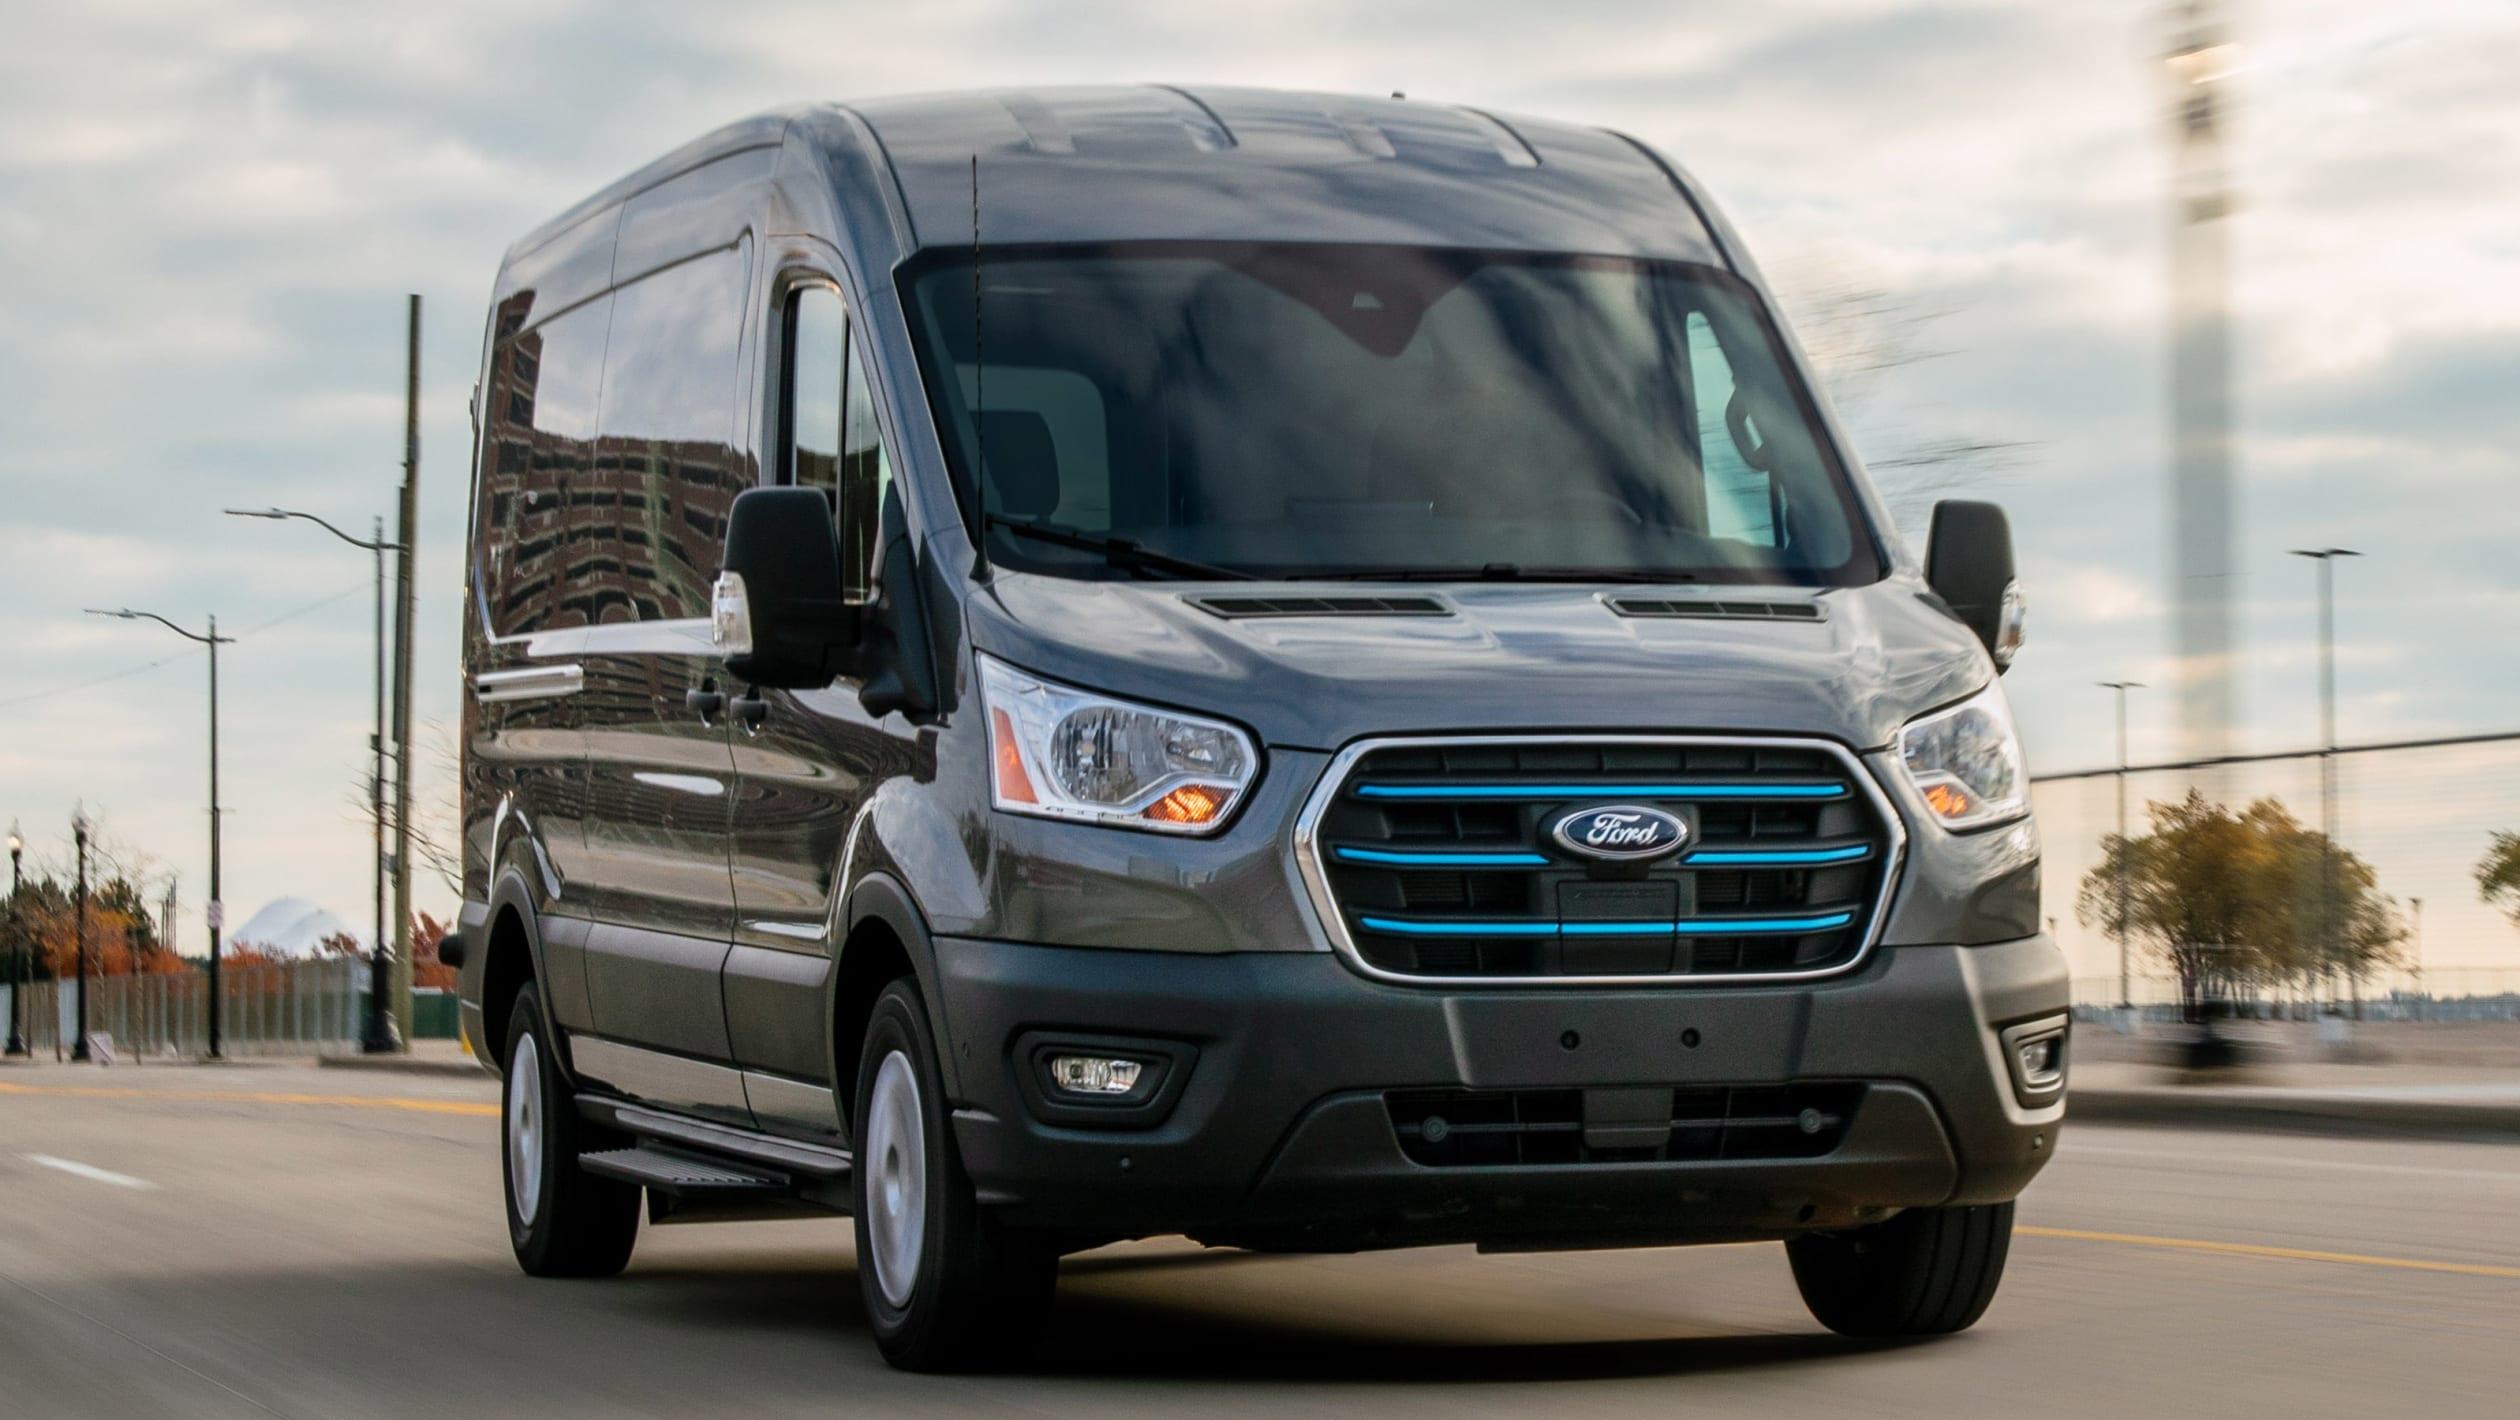 New Ford E-Transit van 2020-3.jpeg